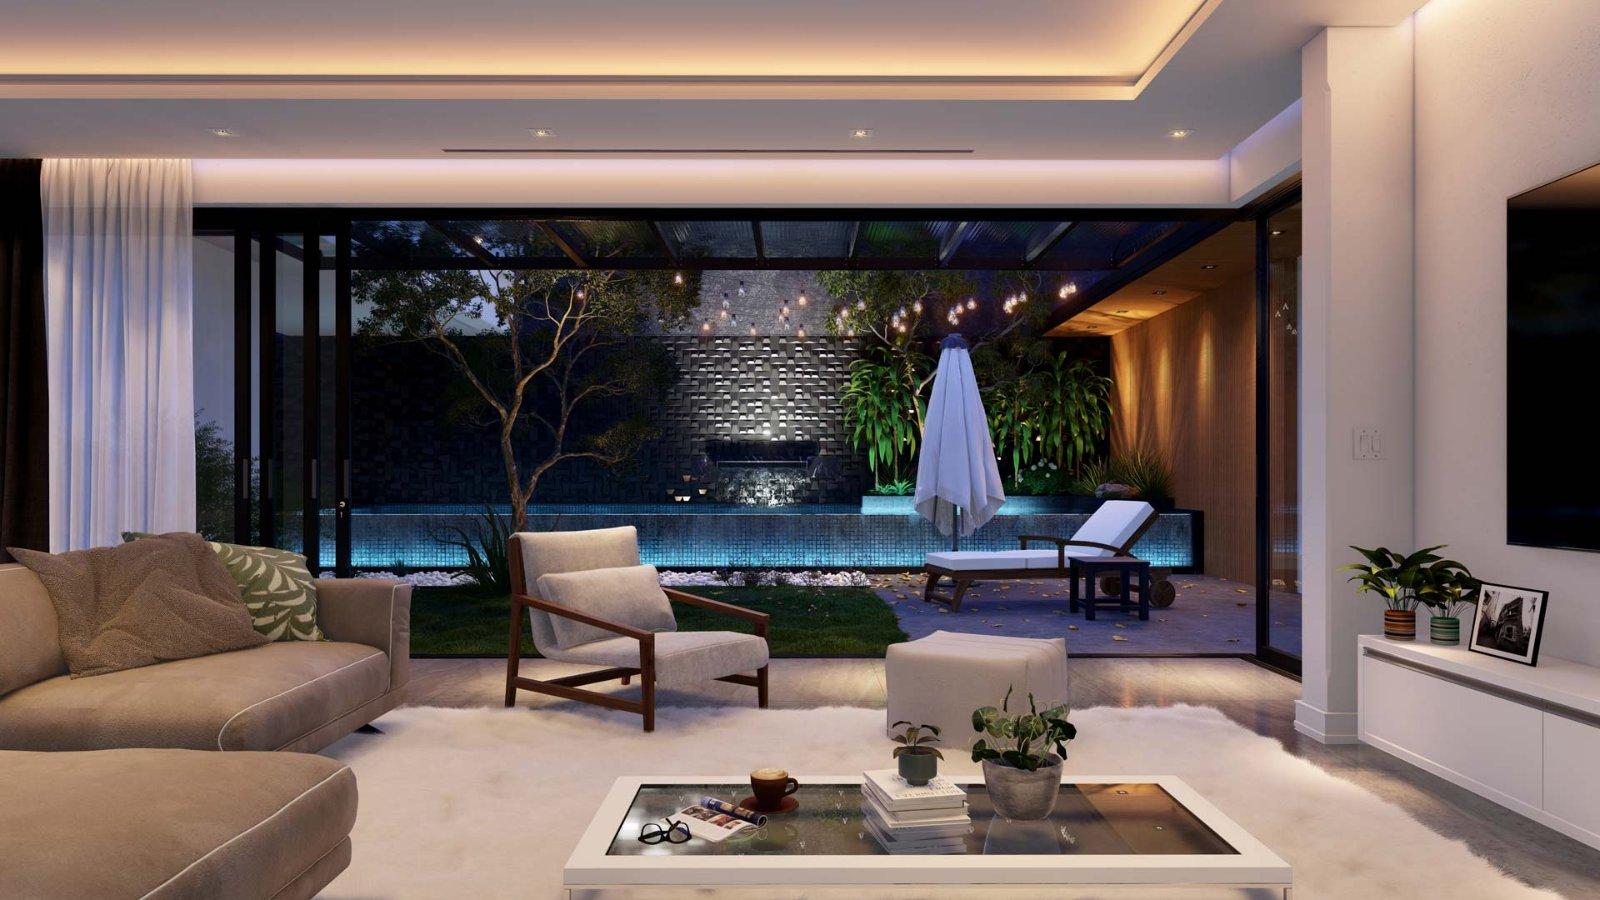 Residential-interior-1920x1080_Lumion10.jpg